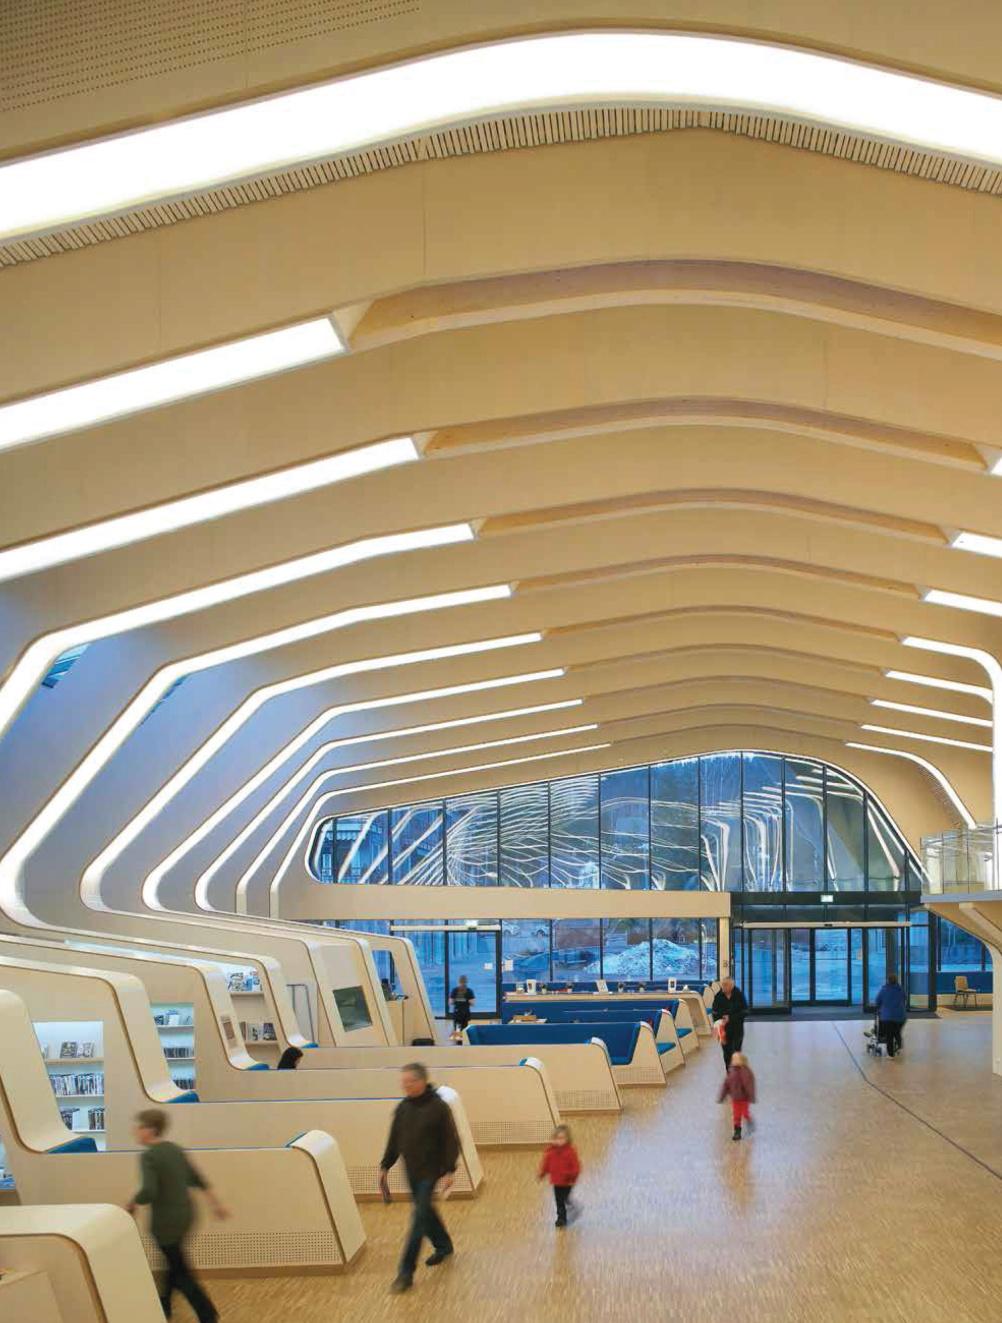 Vennesla Library and Culture House, Vennesla, Norway